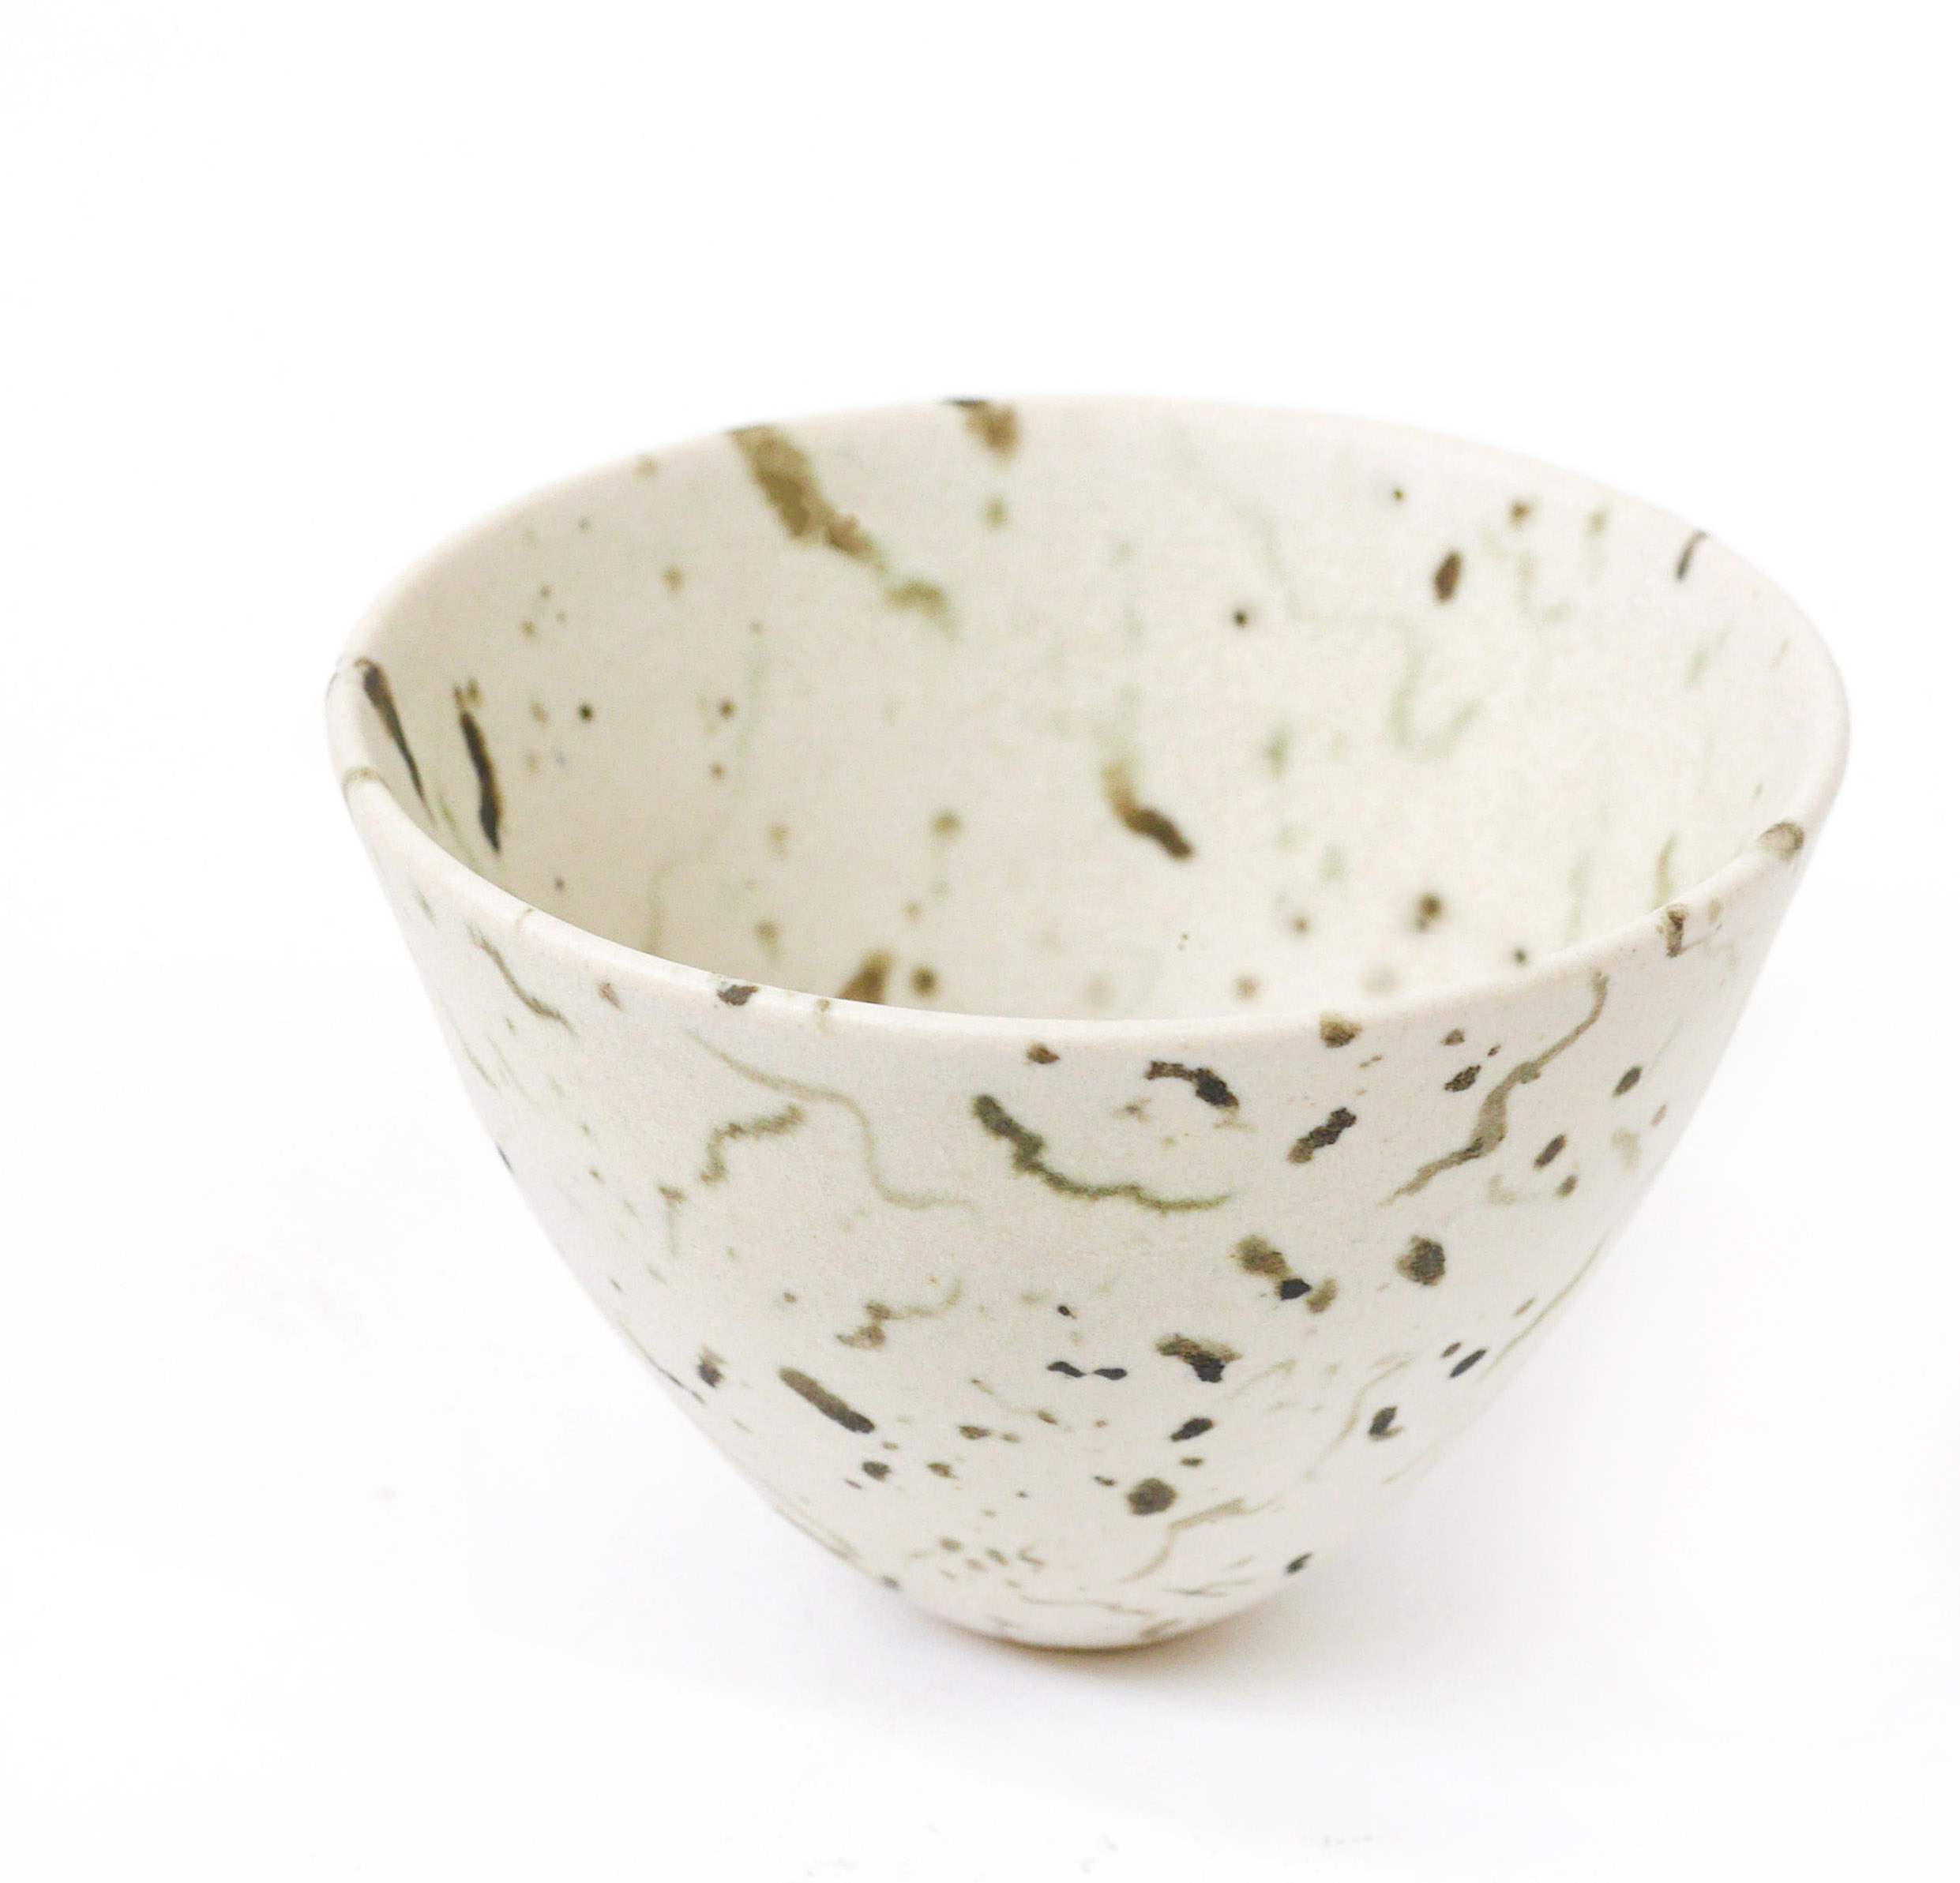 Matte glazed thrown and handpainted stoneware 'Cirl Bunting' eggshell bowl